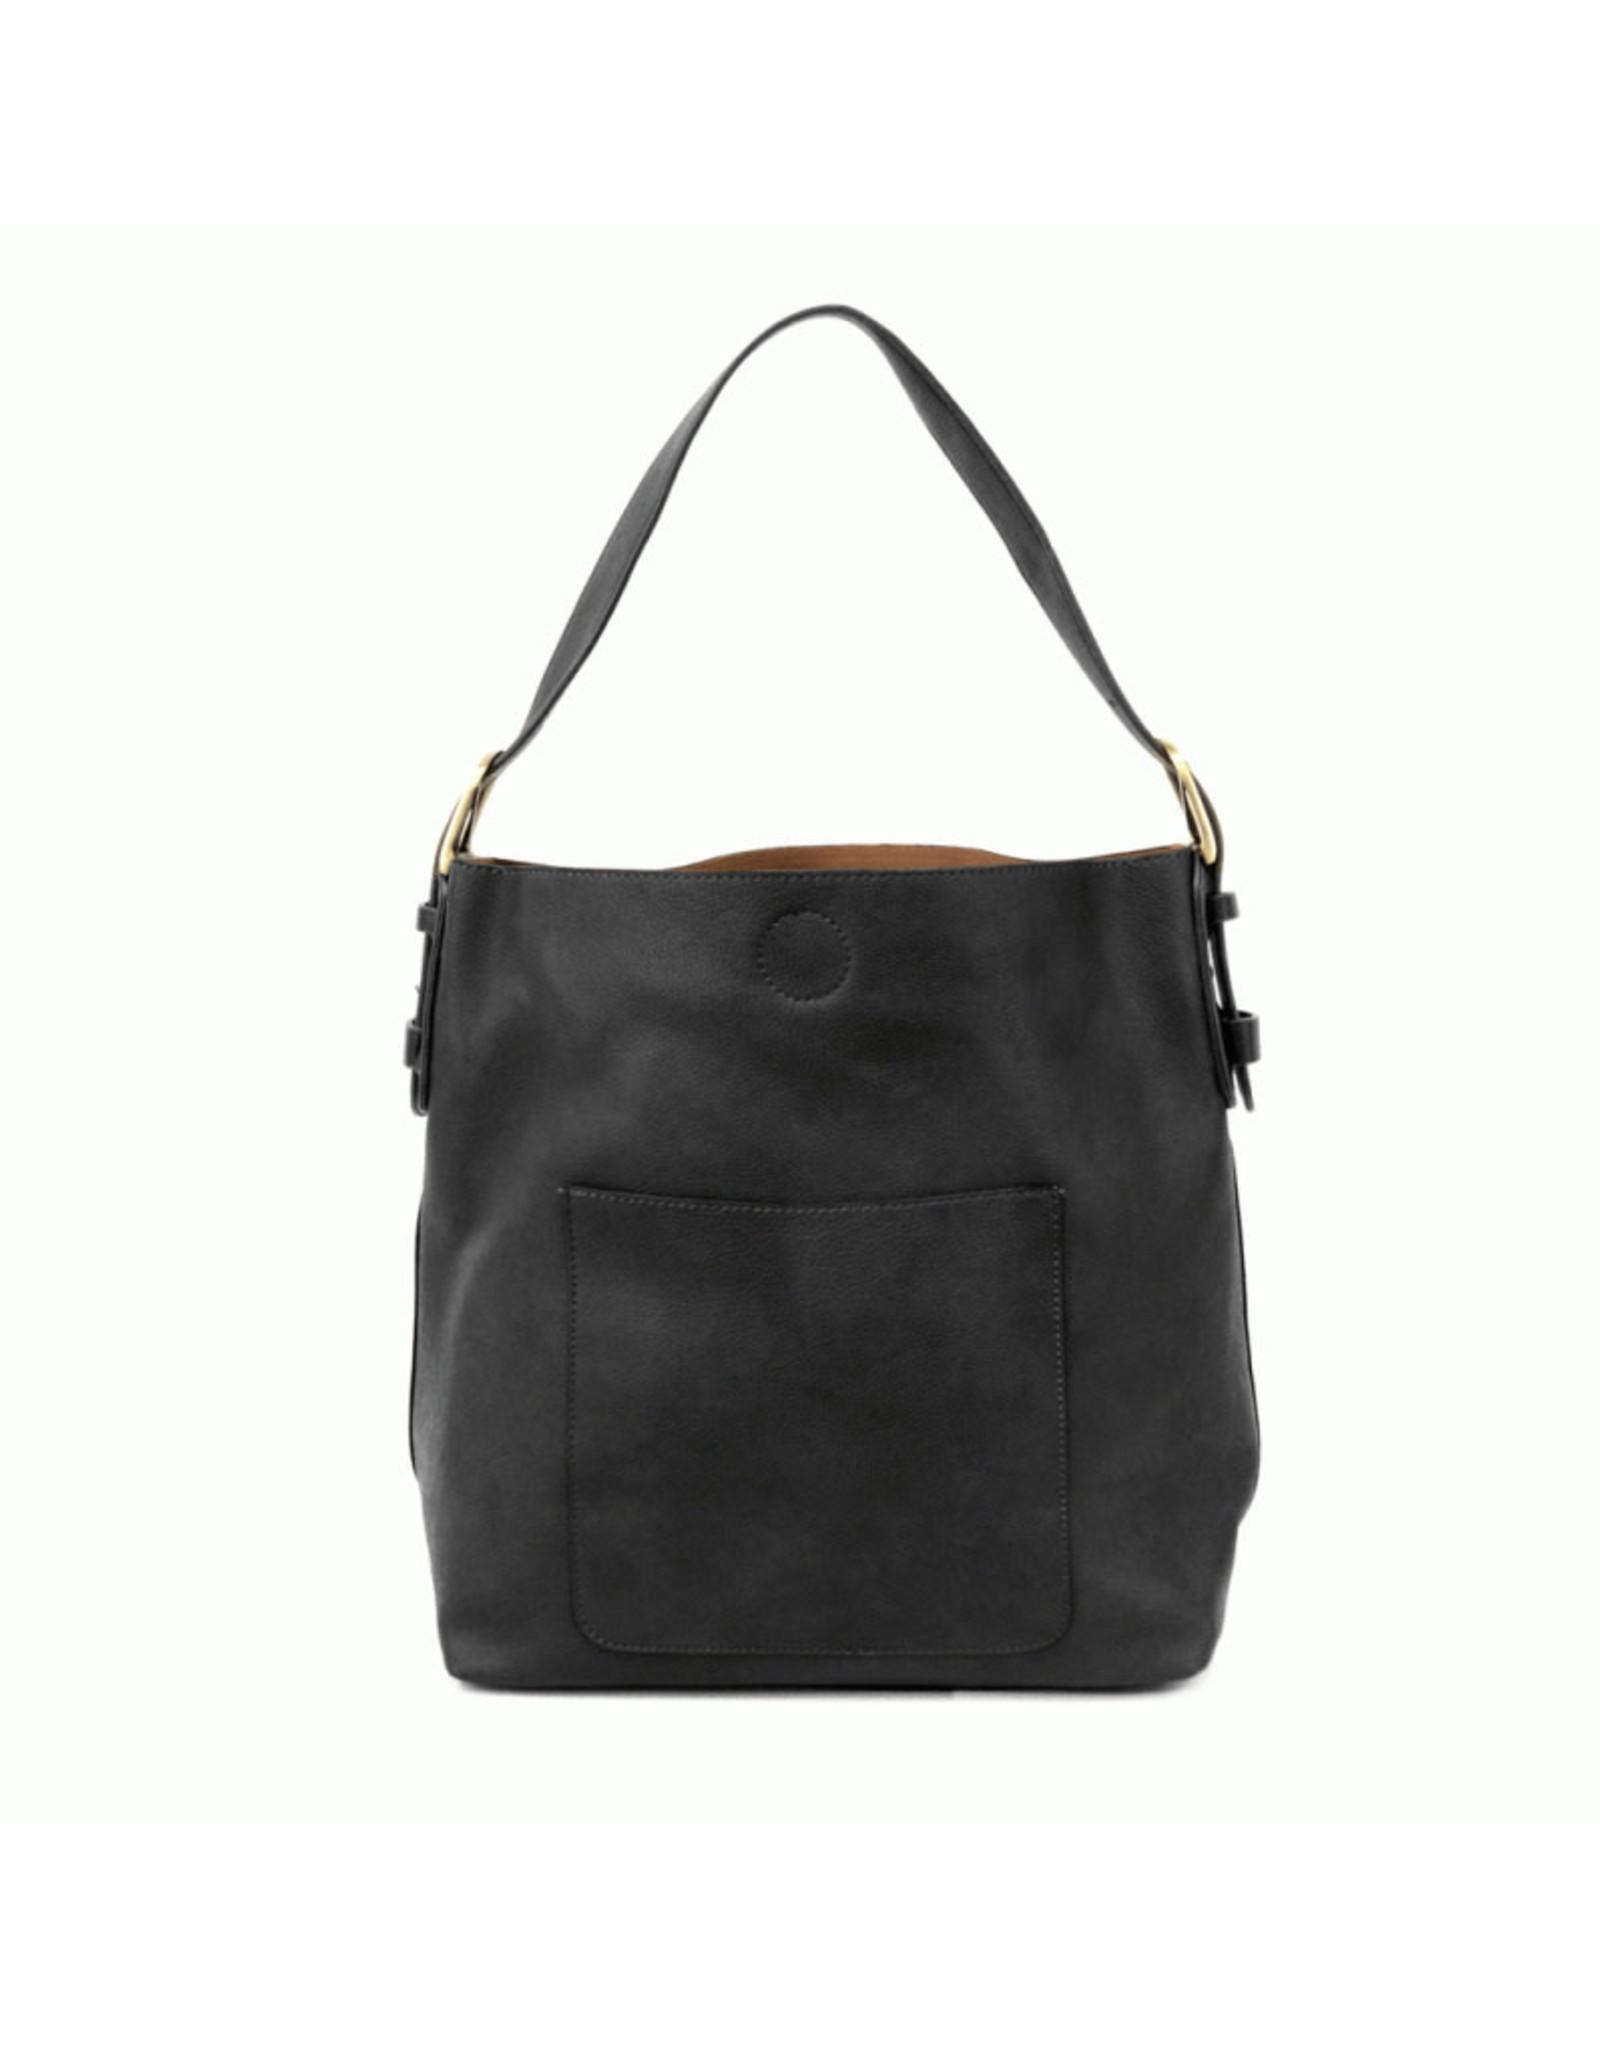 Classic Hobo Tote Bag